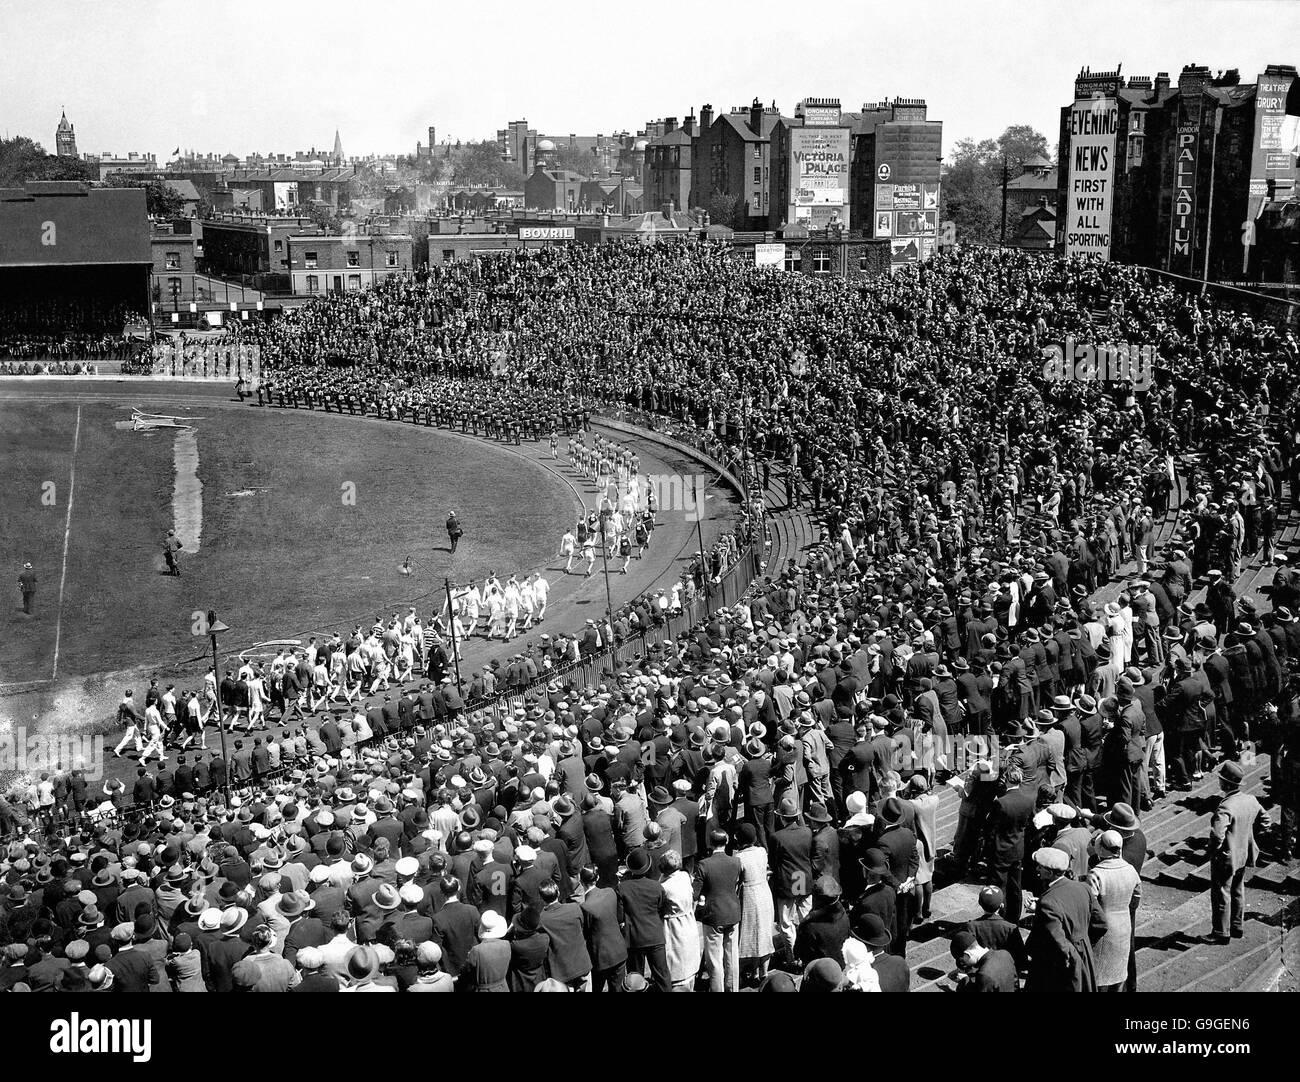 Athletics - British Games - Parade Of Athletes - London - 1931 Stock Photo